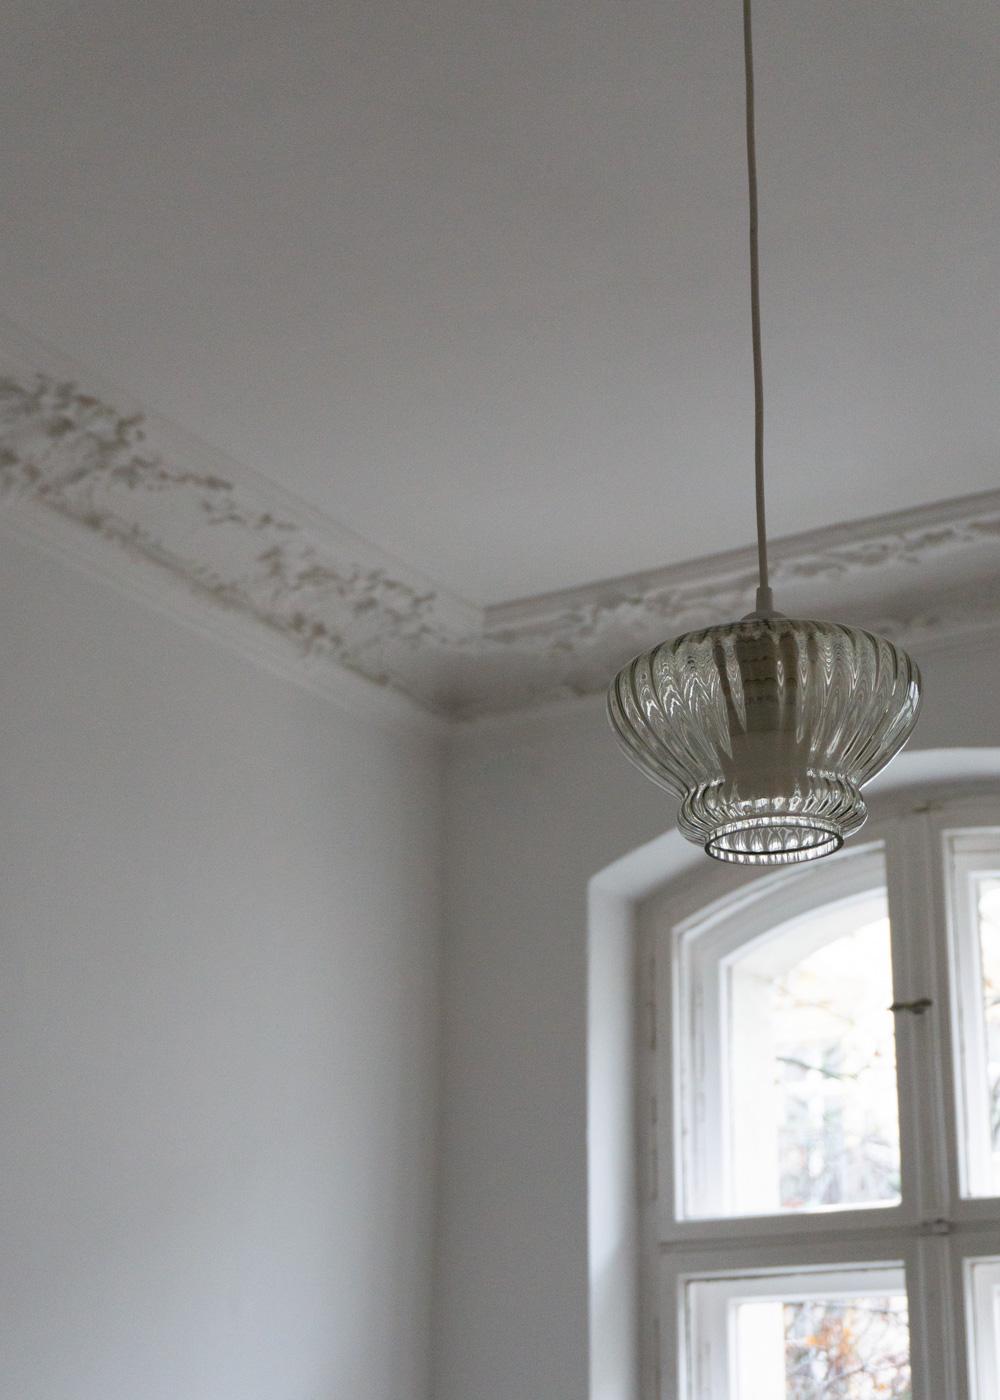 berlin-altbau-interior-design-style-minimal-white-beige-turn-scandinavian-designer-rgdaily-rg-daily-blog-3